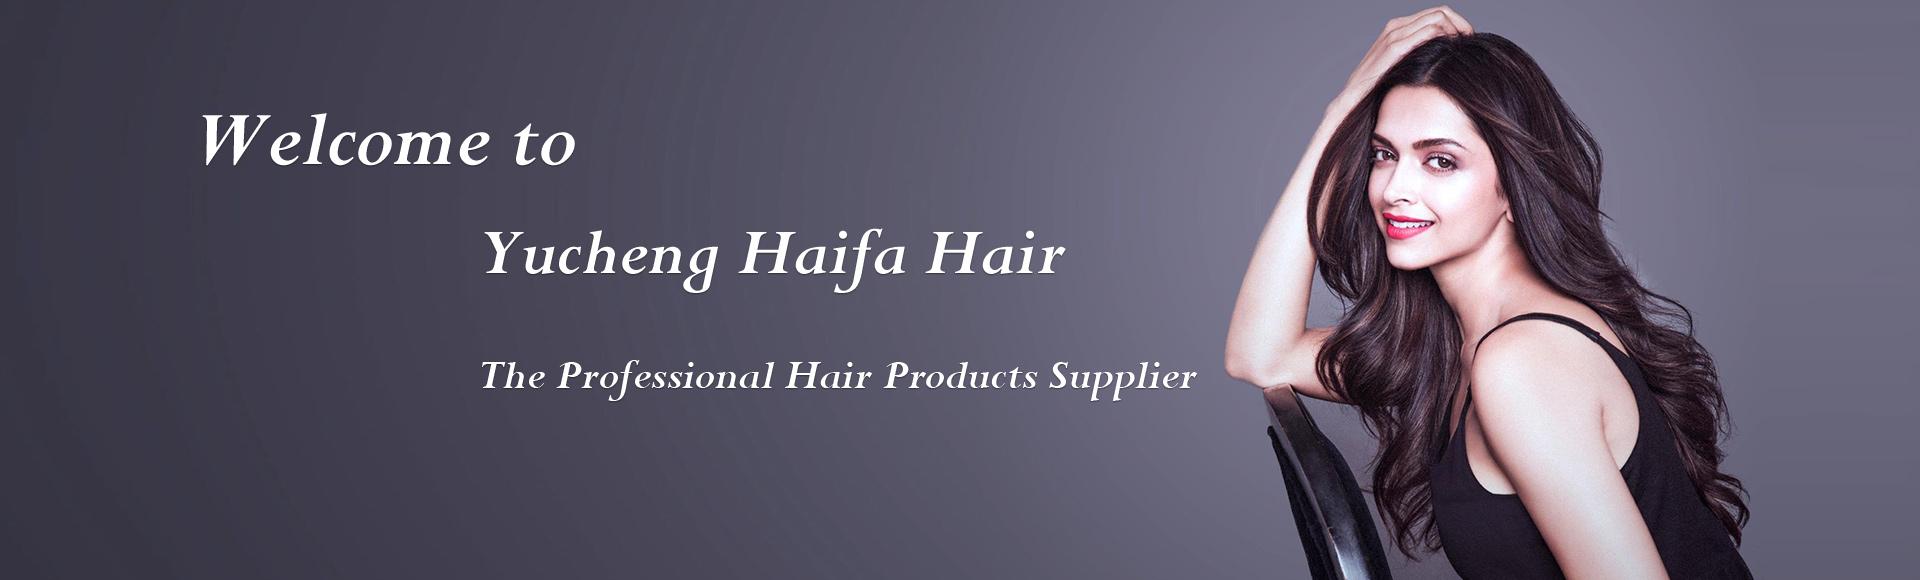 Yucheng Haifa Hair